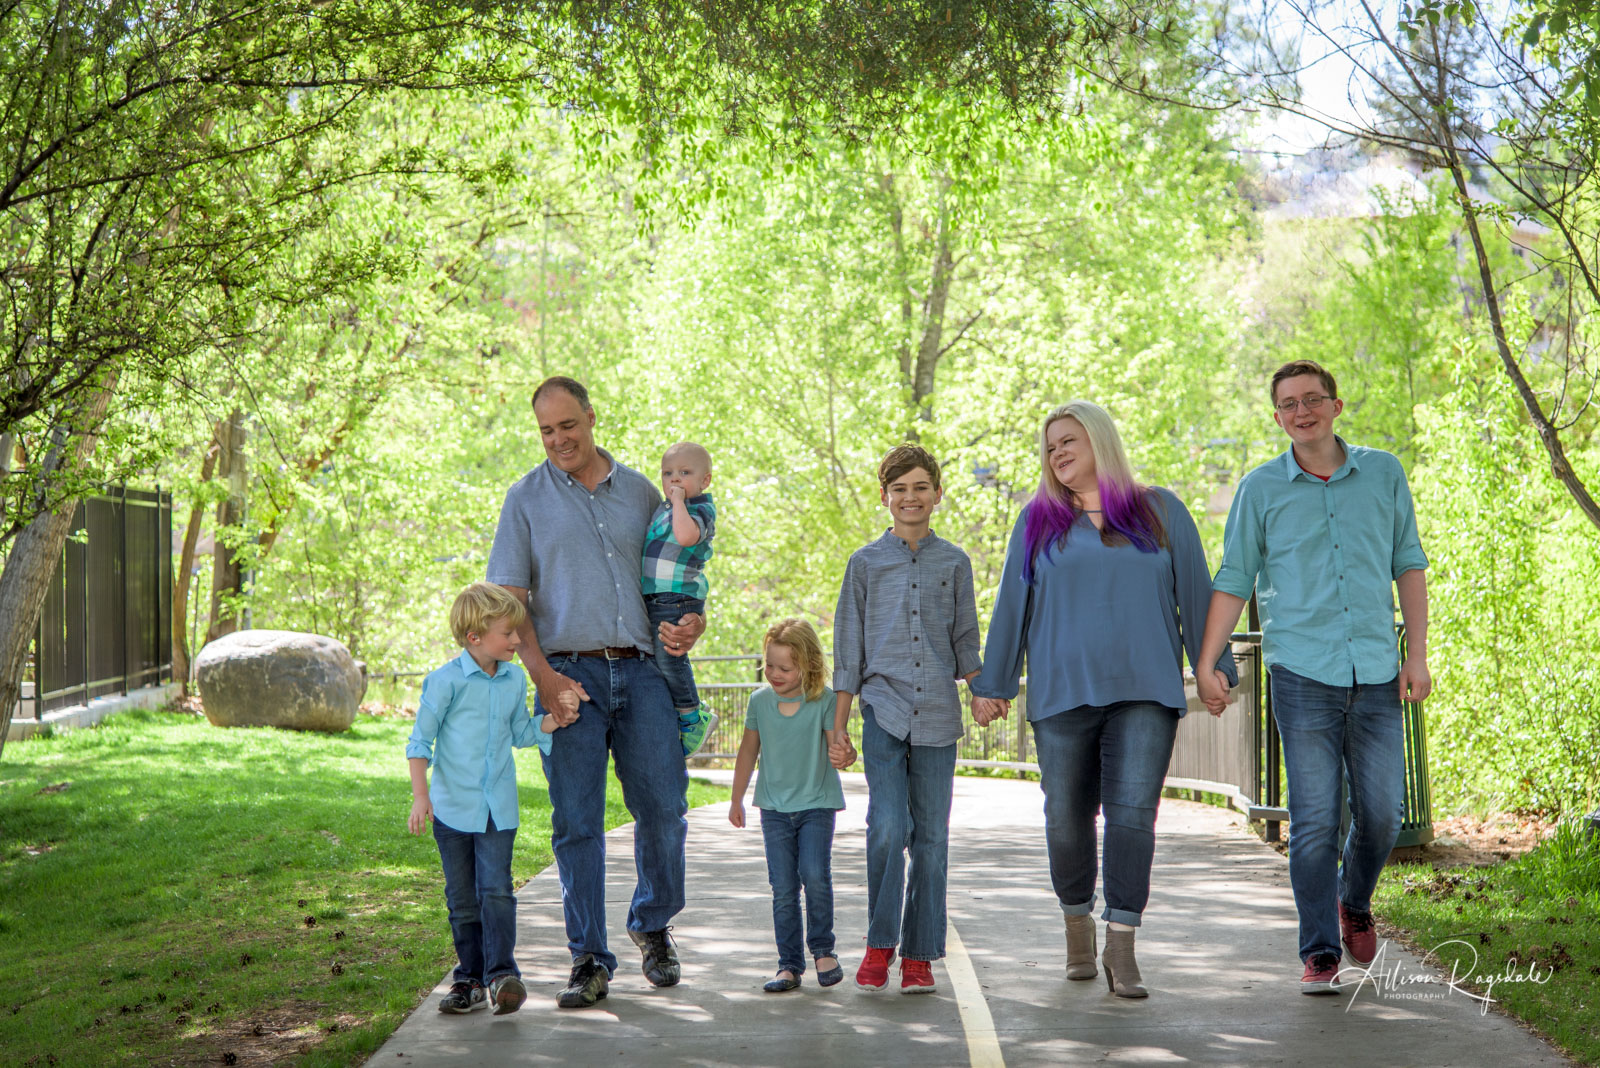 Outdoor family portraits in Durango, Colorado